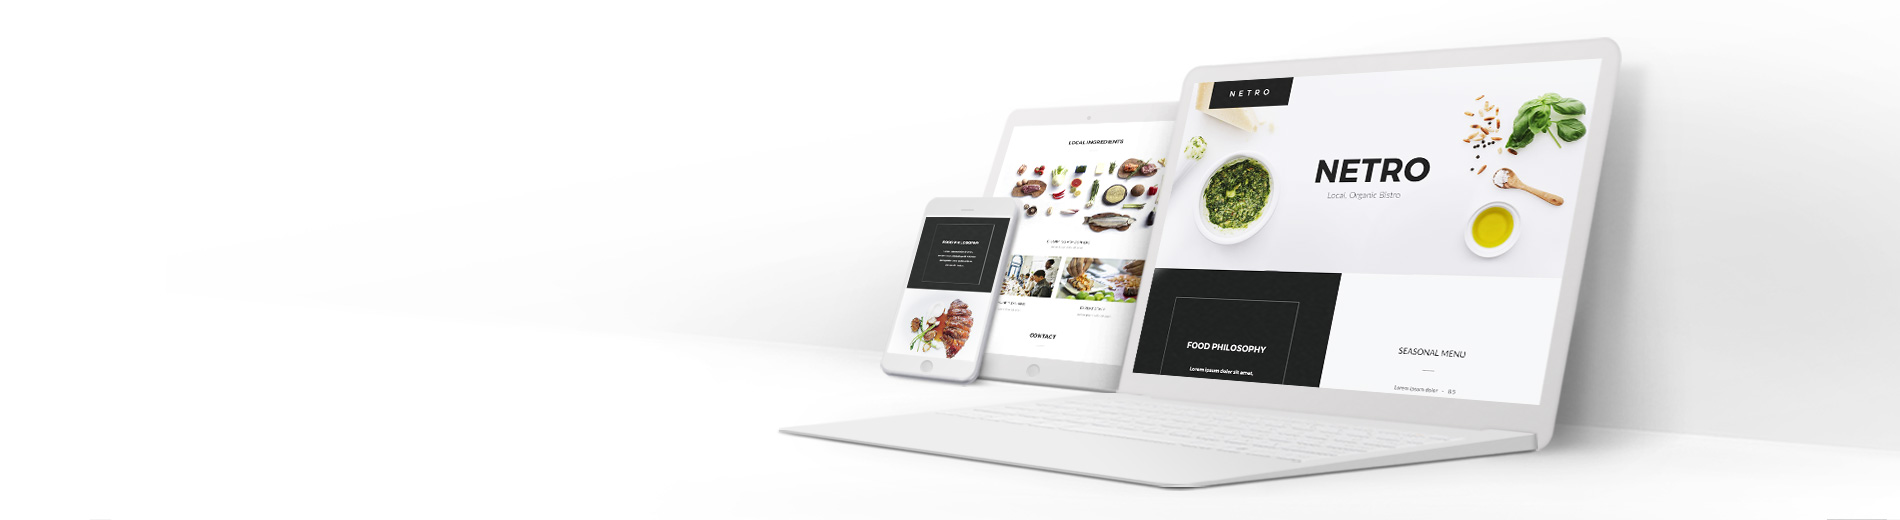 new-website-builder-white-device-static_image_1900x520-v2